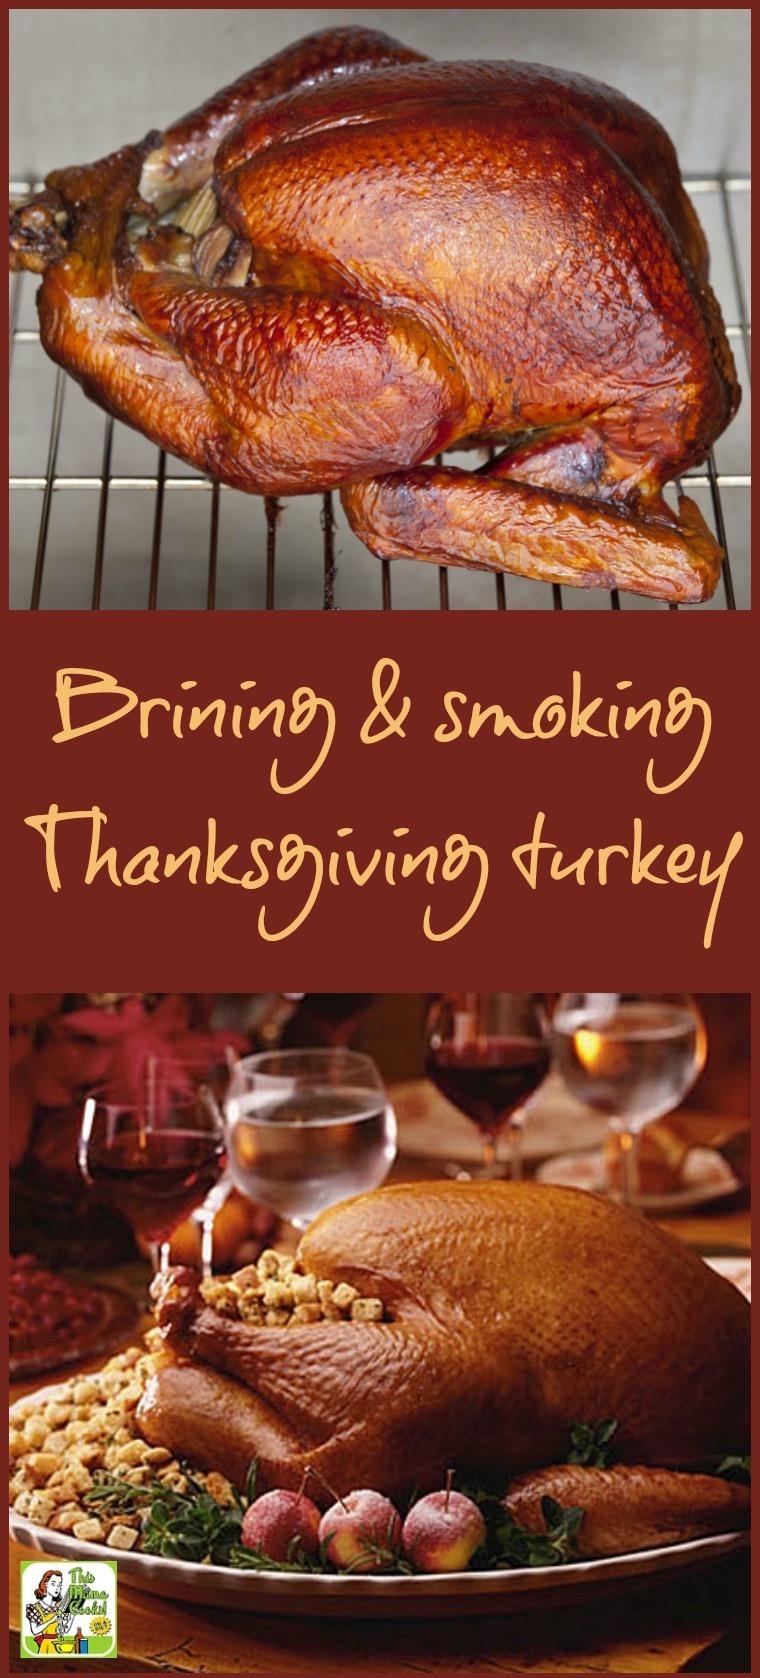 Brining Turkey Recipes Thanksgiving  Brining and smoking your Thanksgiving turkey